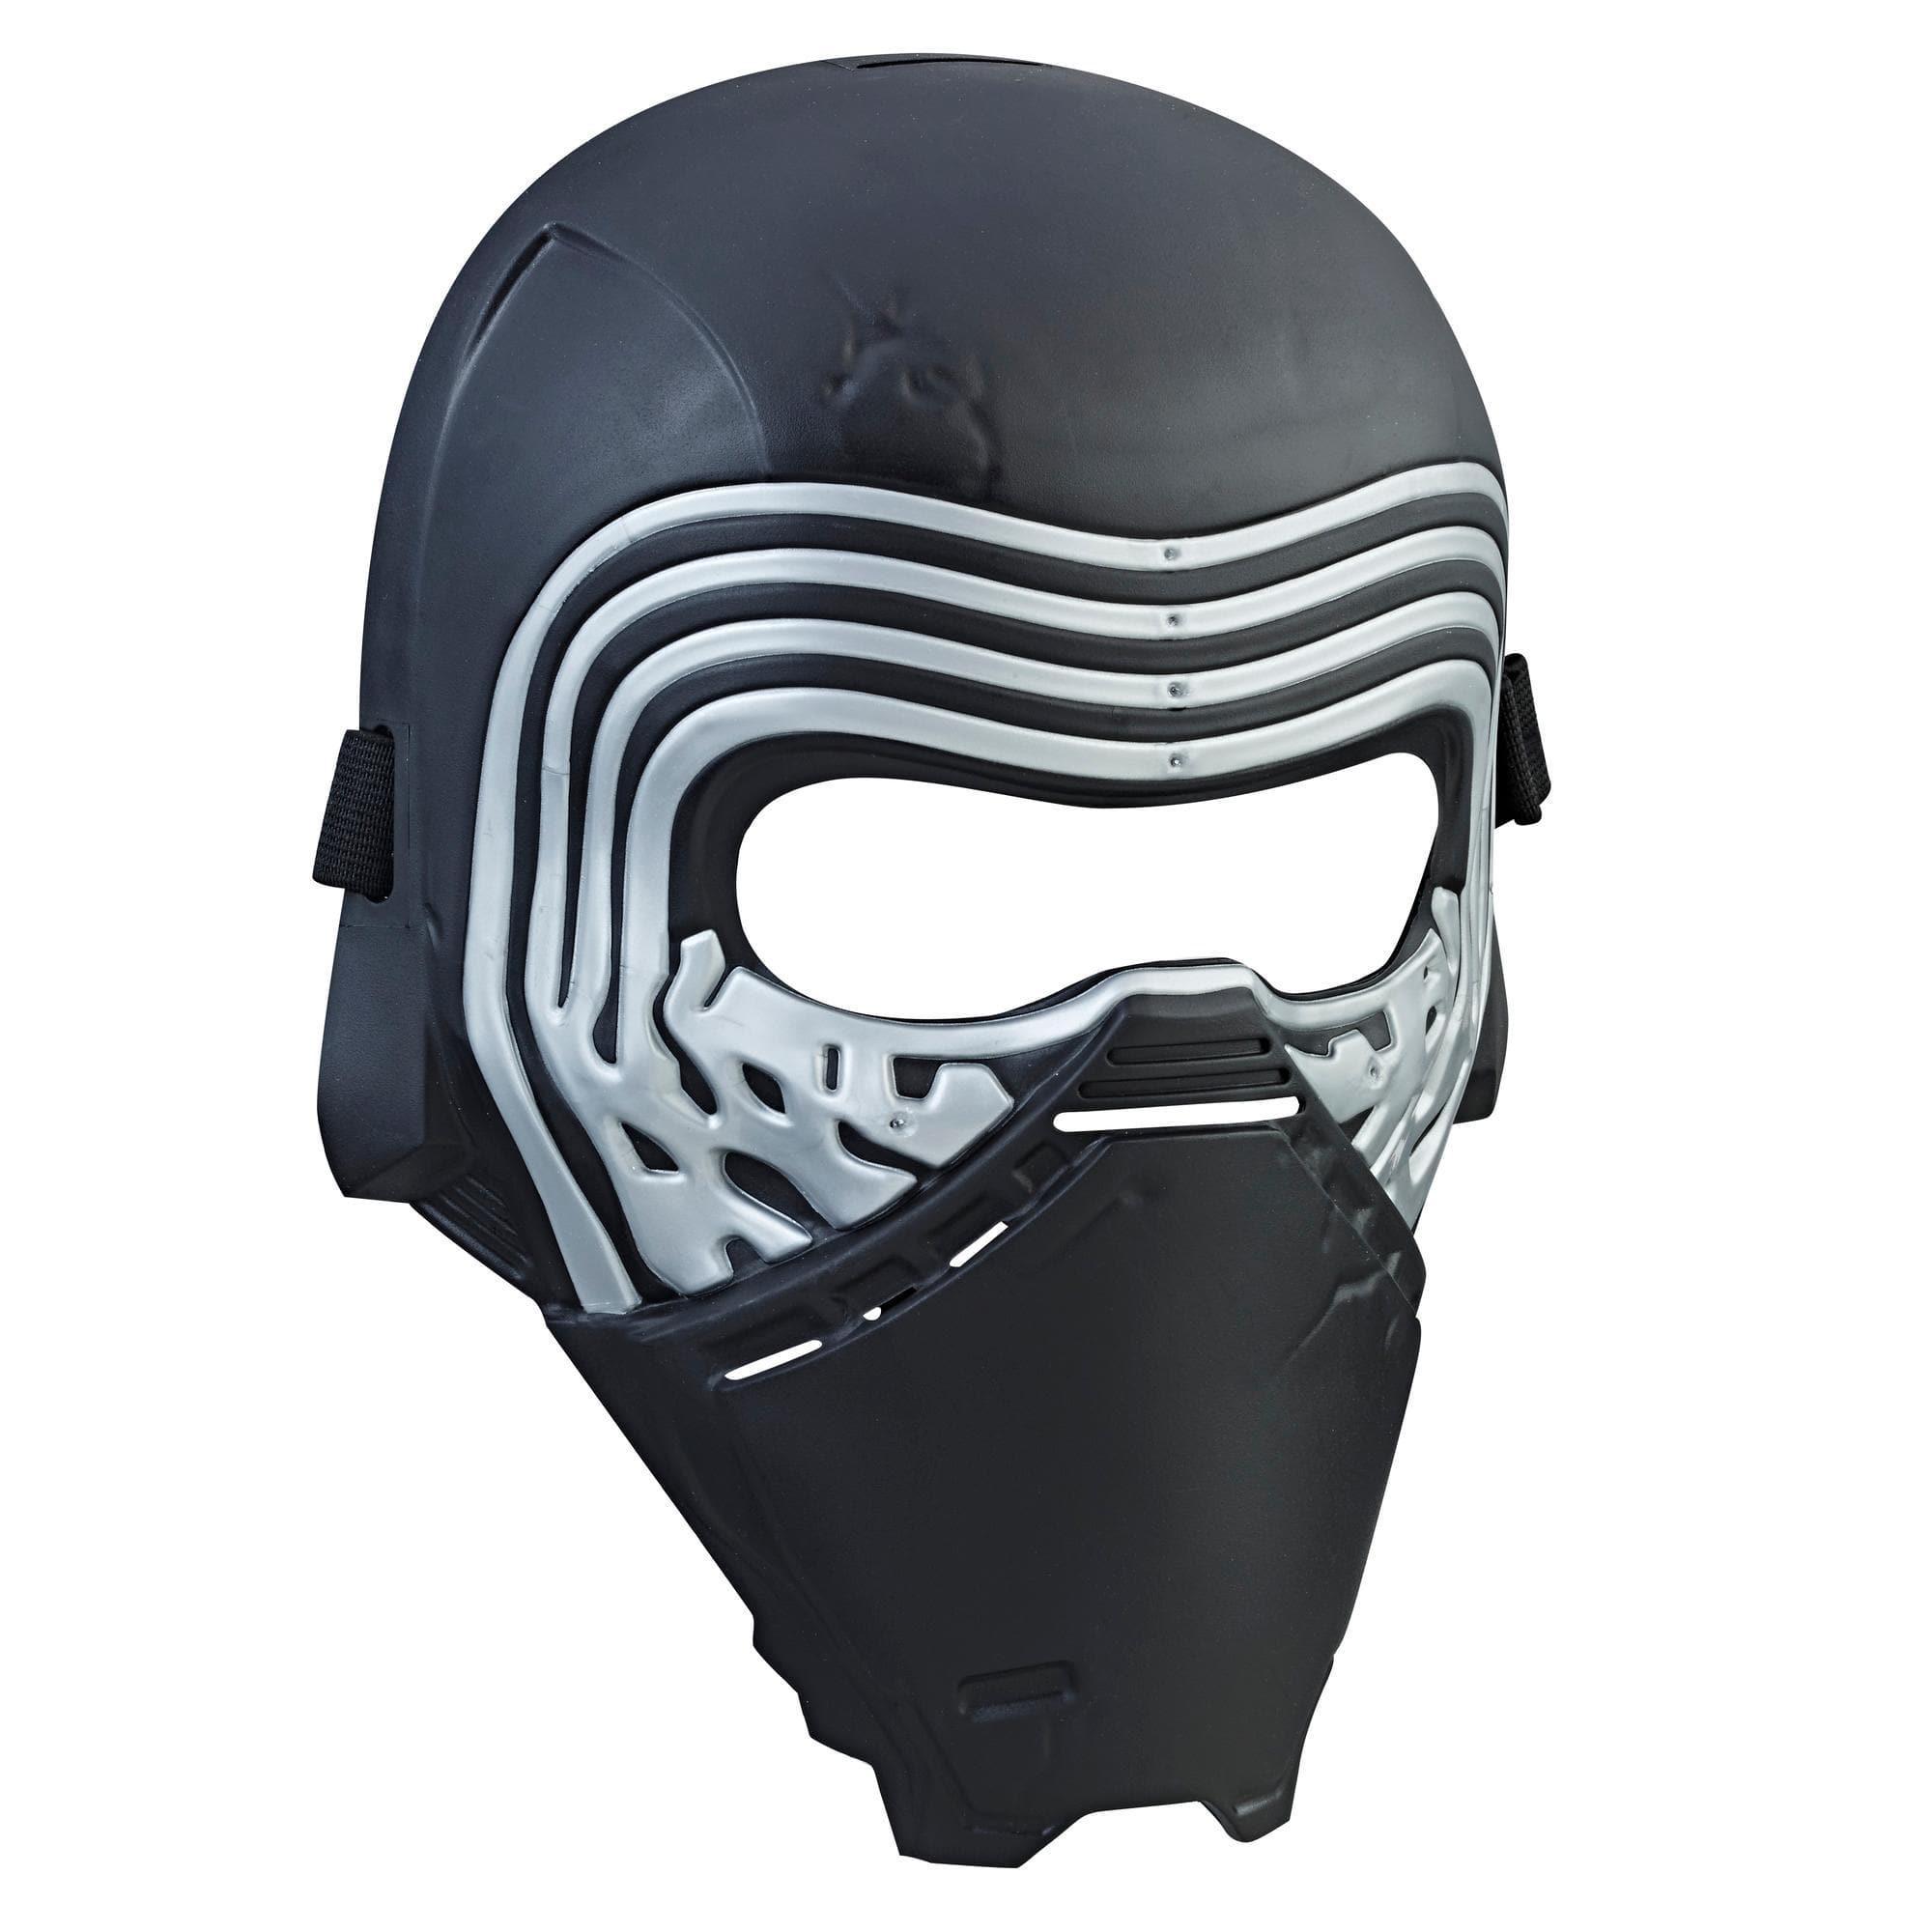 Masca Star Wars The Last Jedi - Kylo Ren